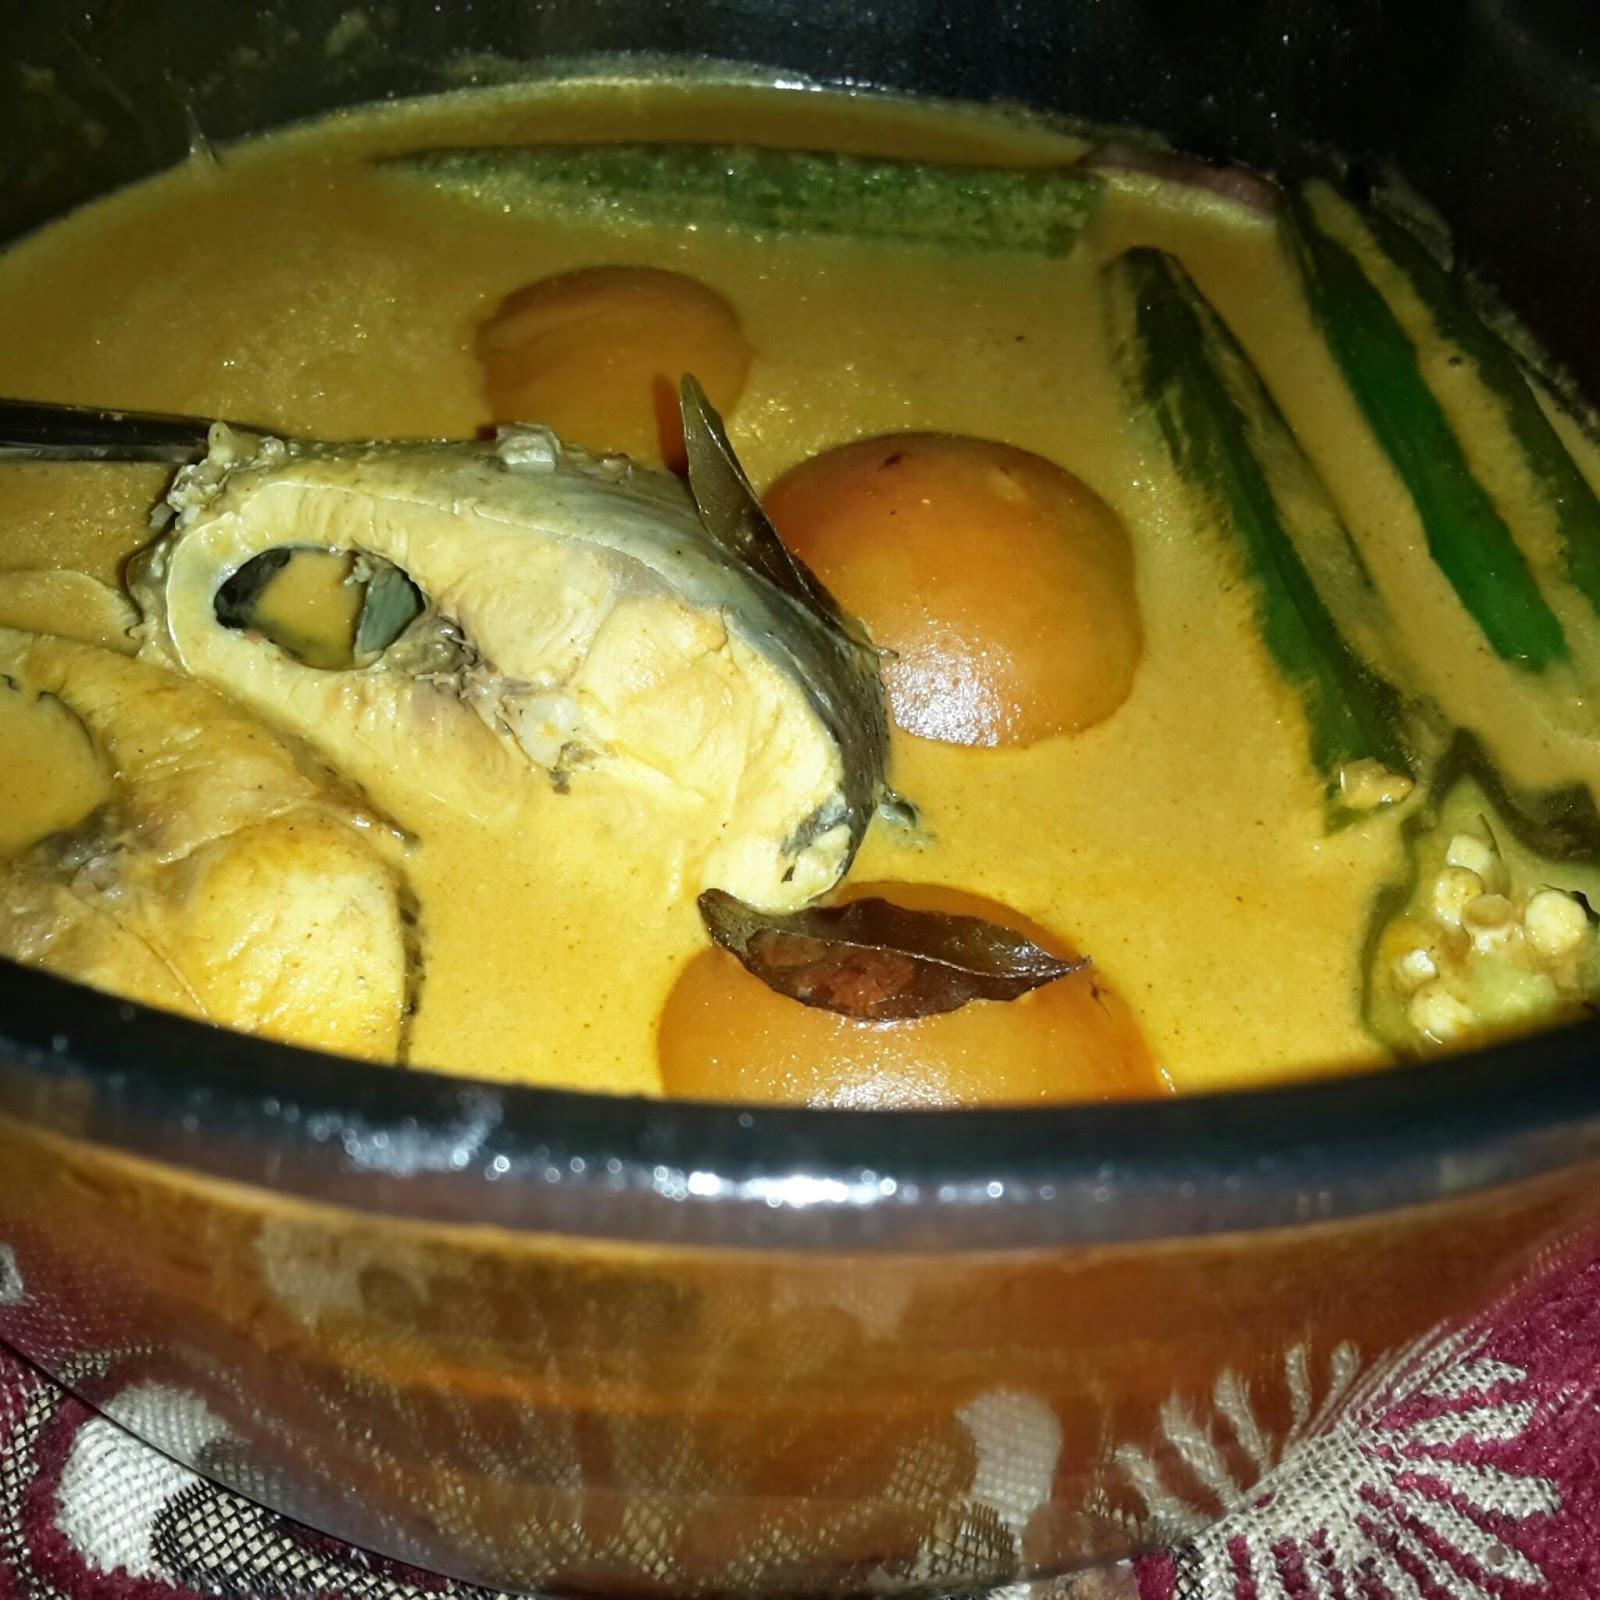 Ikan Susu Masak Kari Menu Ringkas dan Cepat Masak - Azlinda Alin Malaysian Parenting Lifestyle